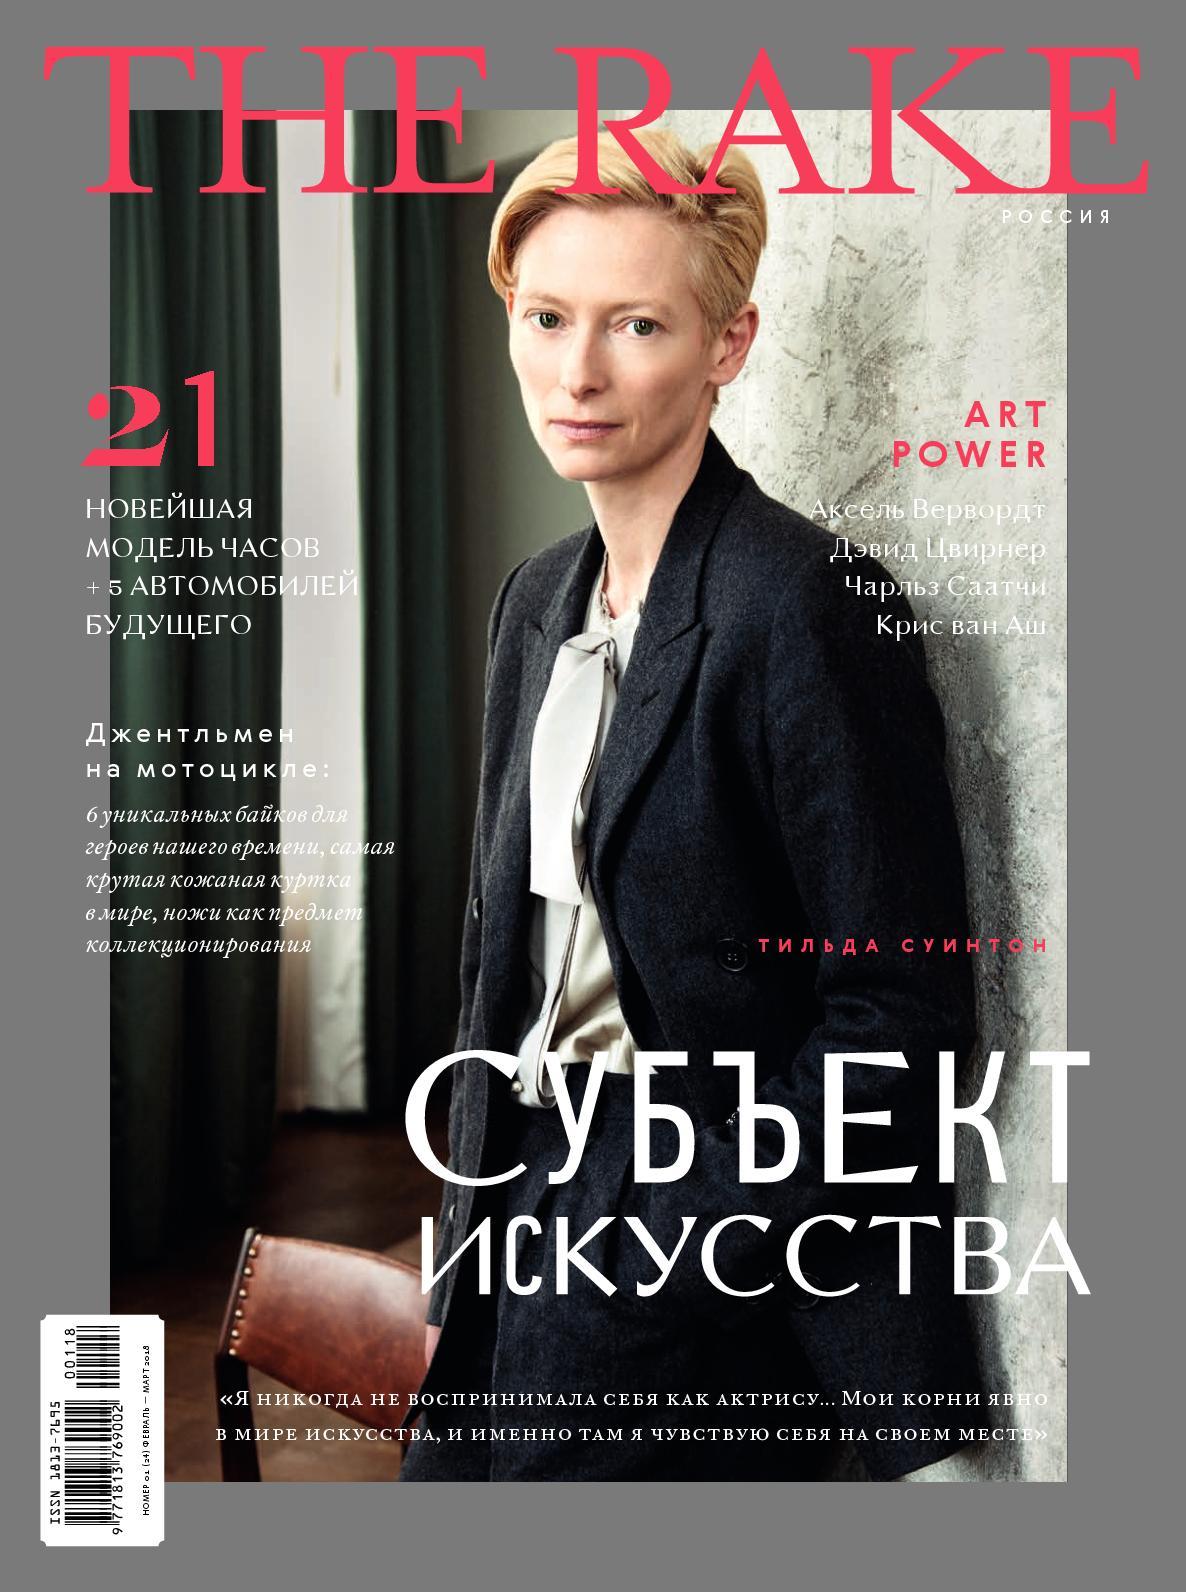 Calamo - The Rake magazine Russian edition 24 issue